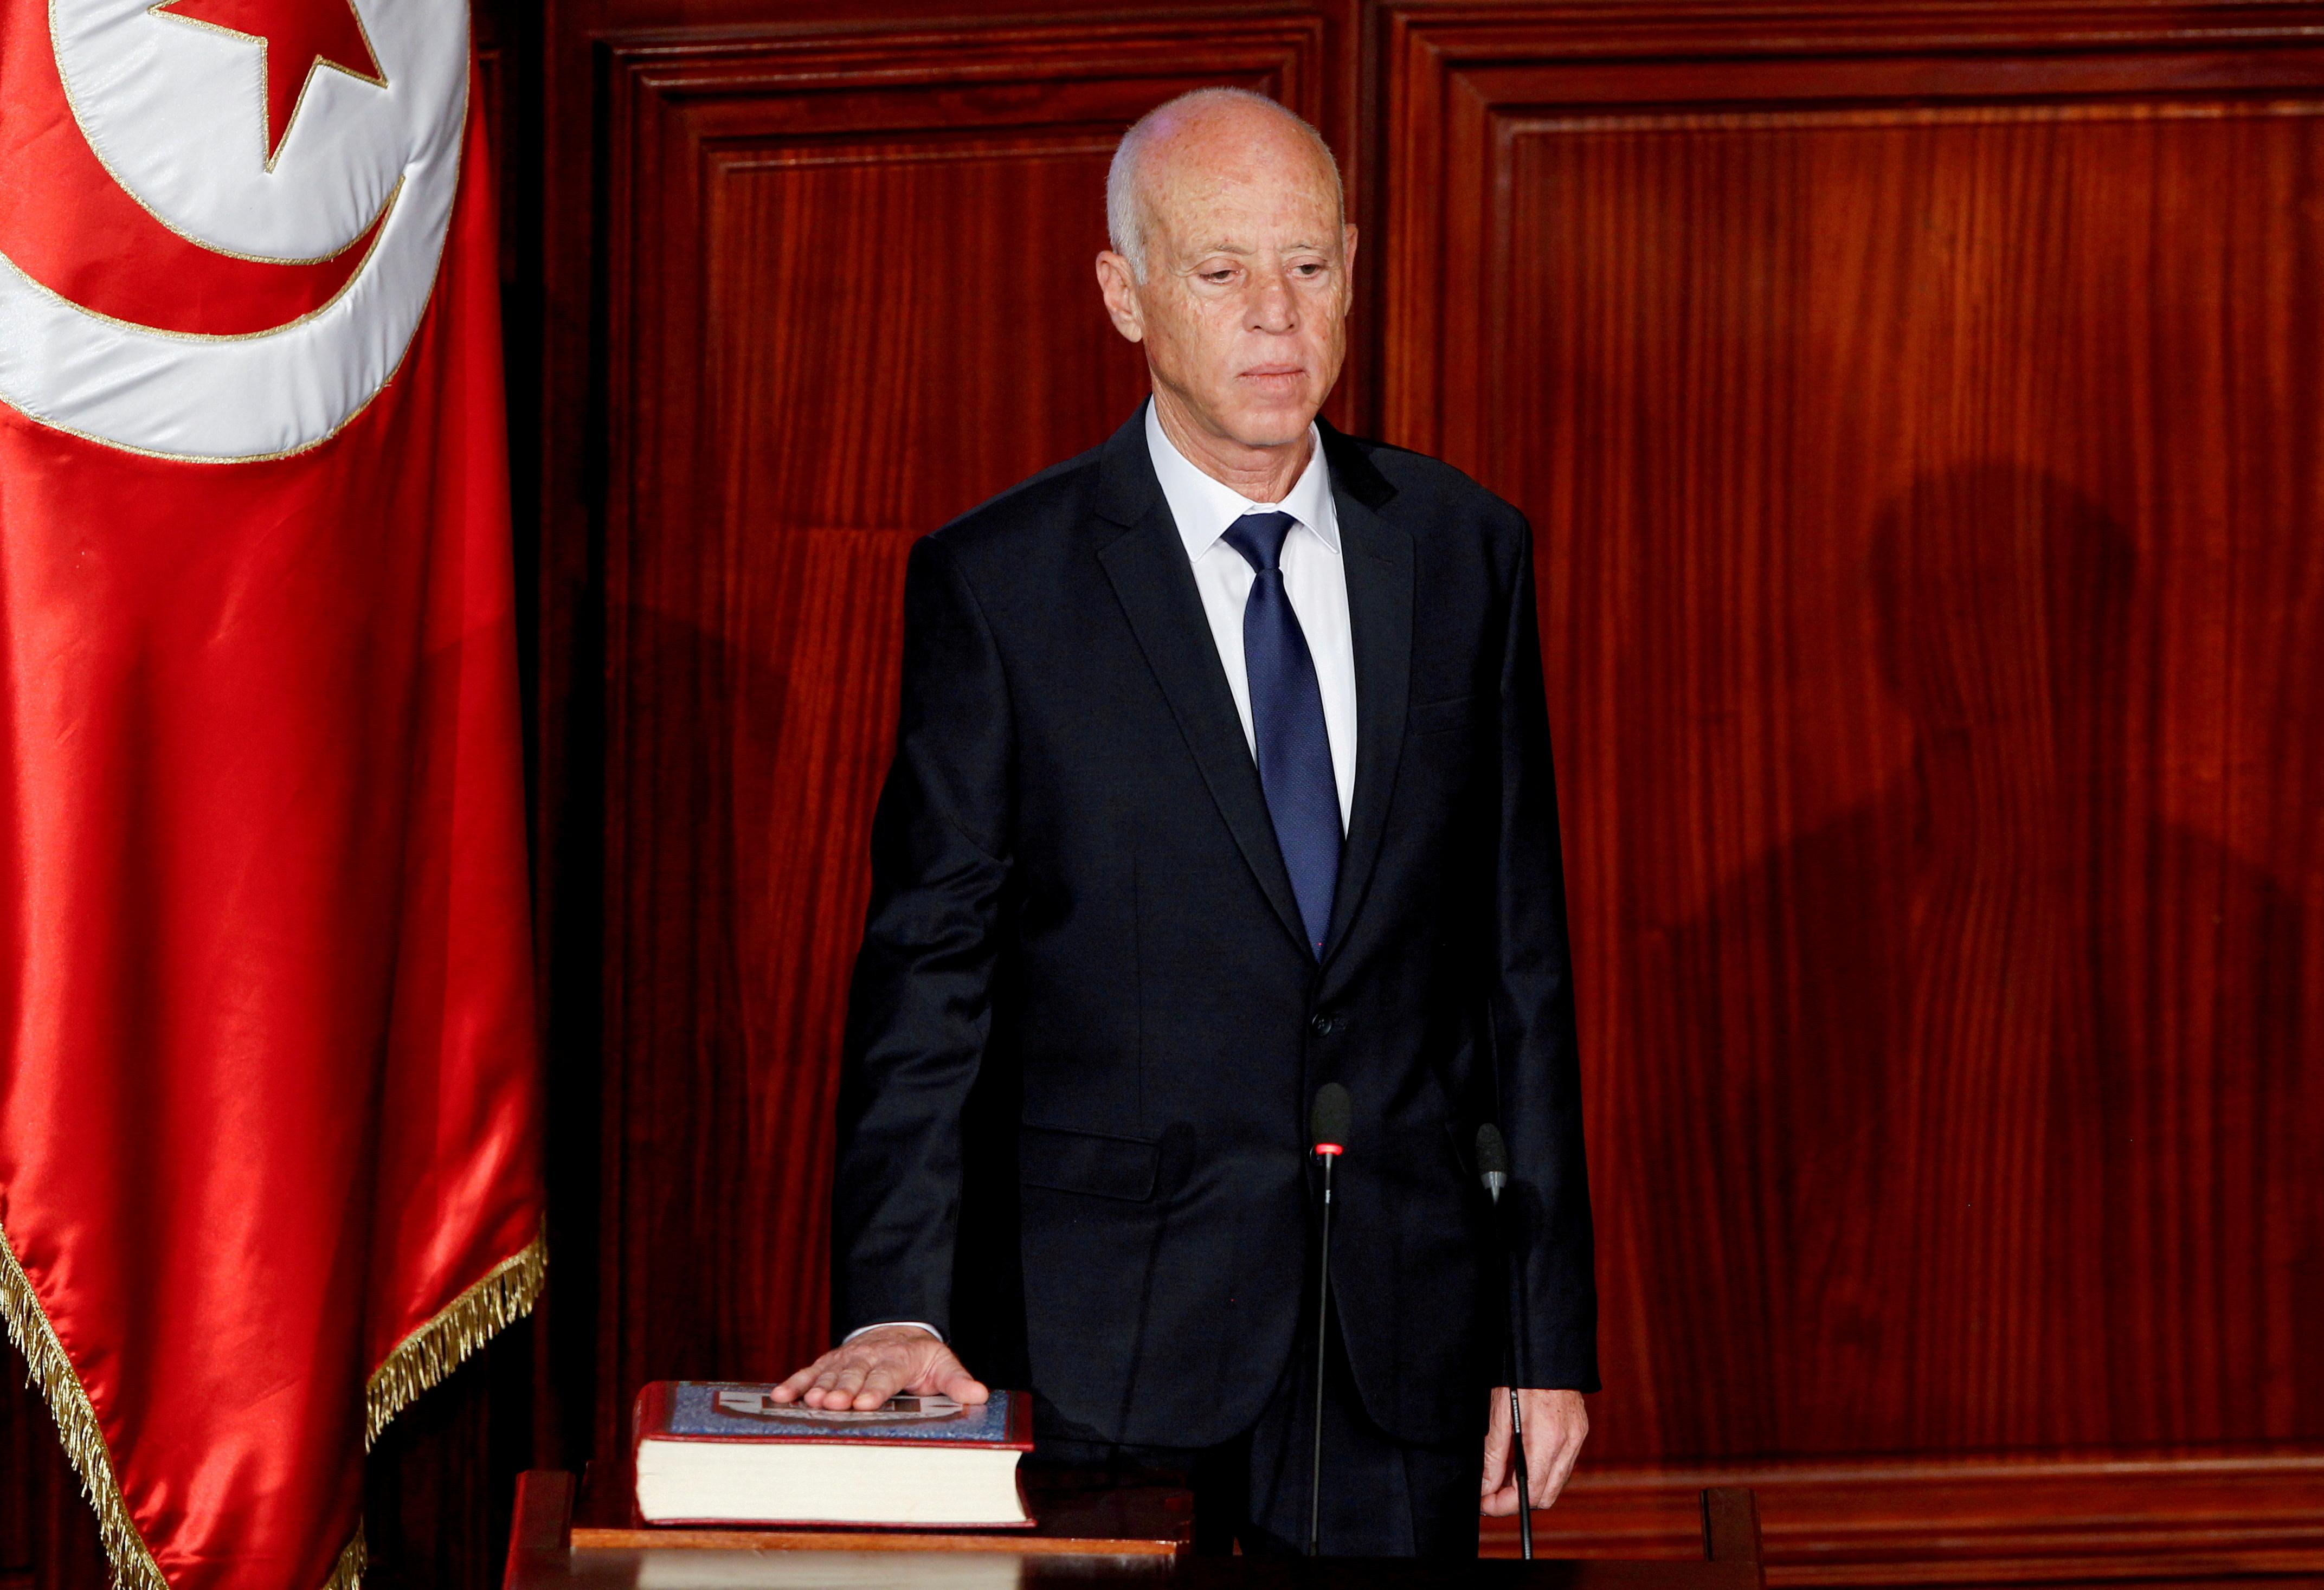 Tunisian President Kais Saied takes the oath of office in Tunis, Tunisia, October 23, 2019. REUTERS/Zoubeir Souissi/File Photo/File Photo